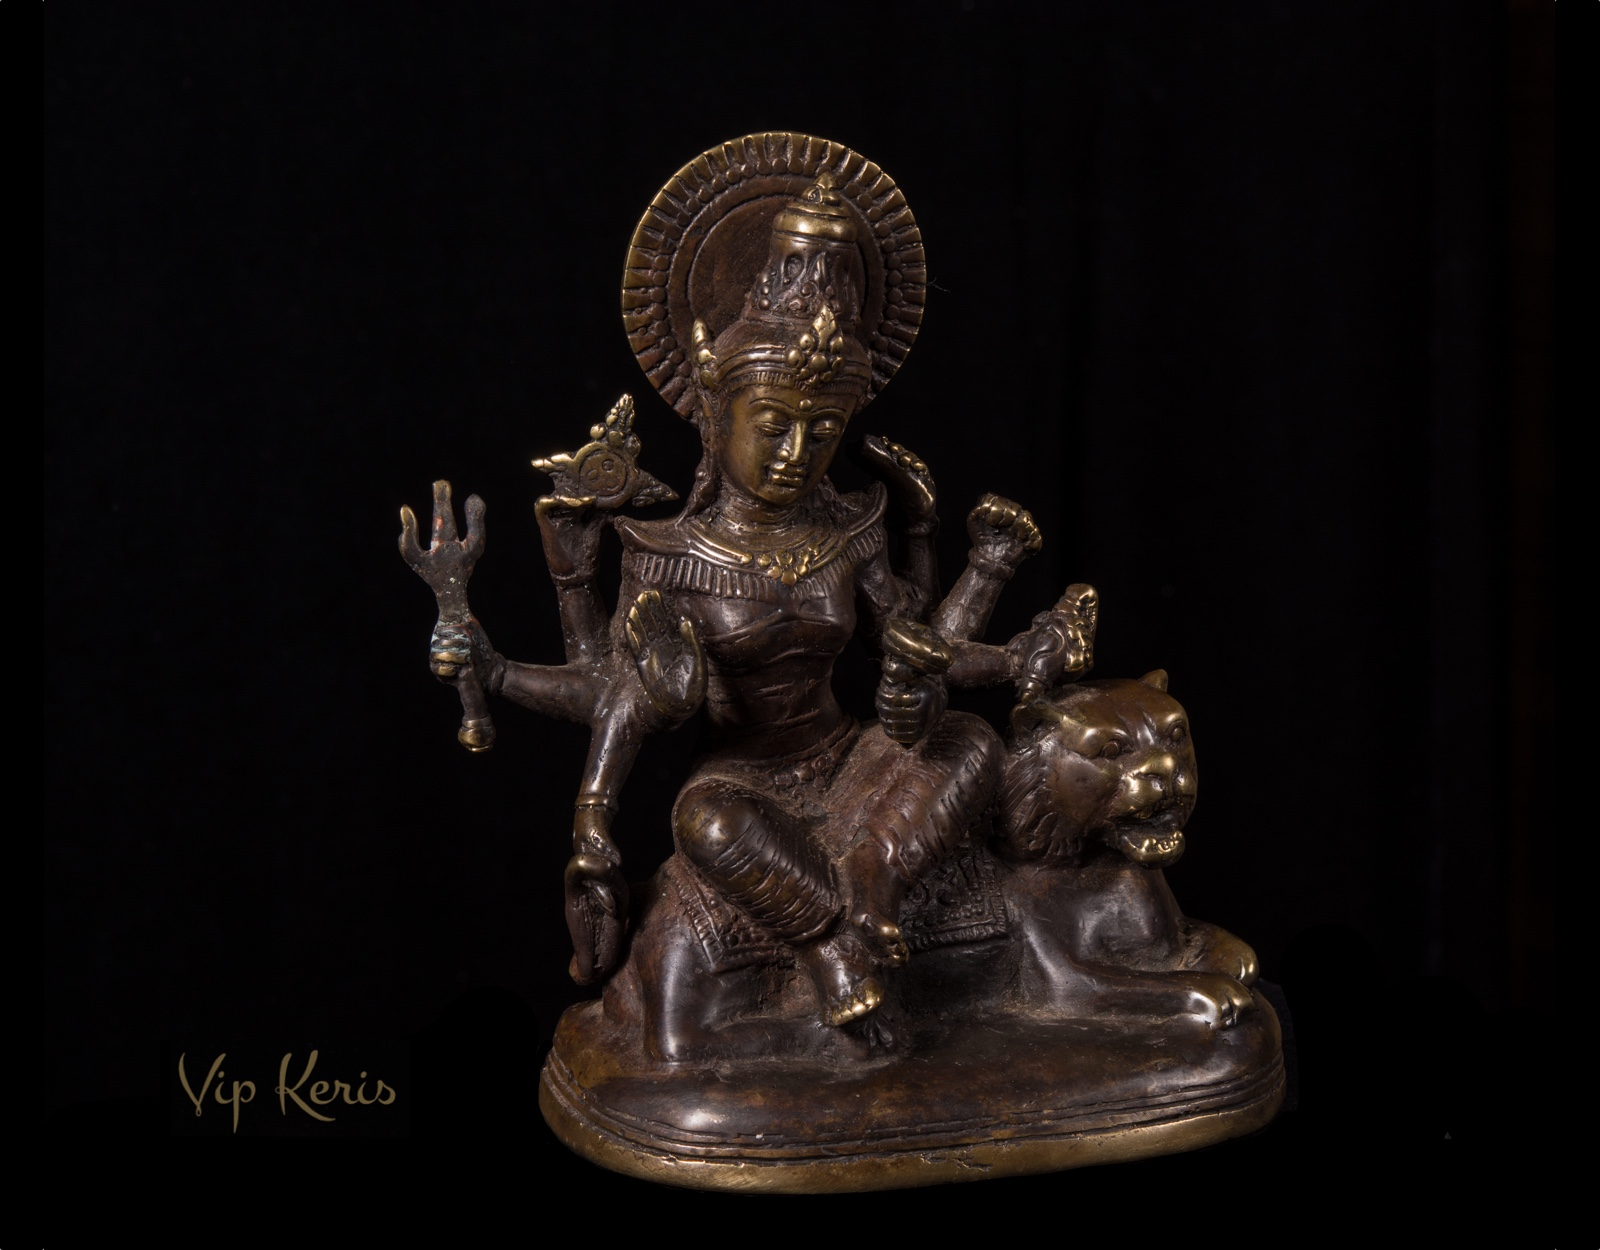 Бронзовая статуя божества Дурга Деви Чандрагханта фото VipKeris